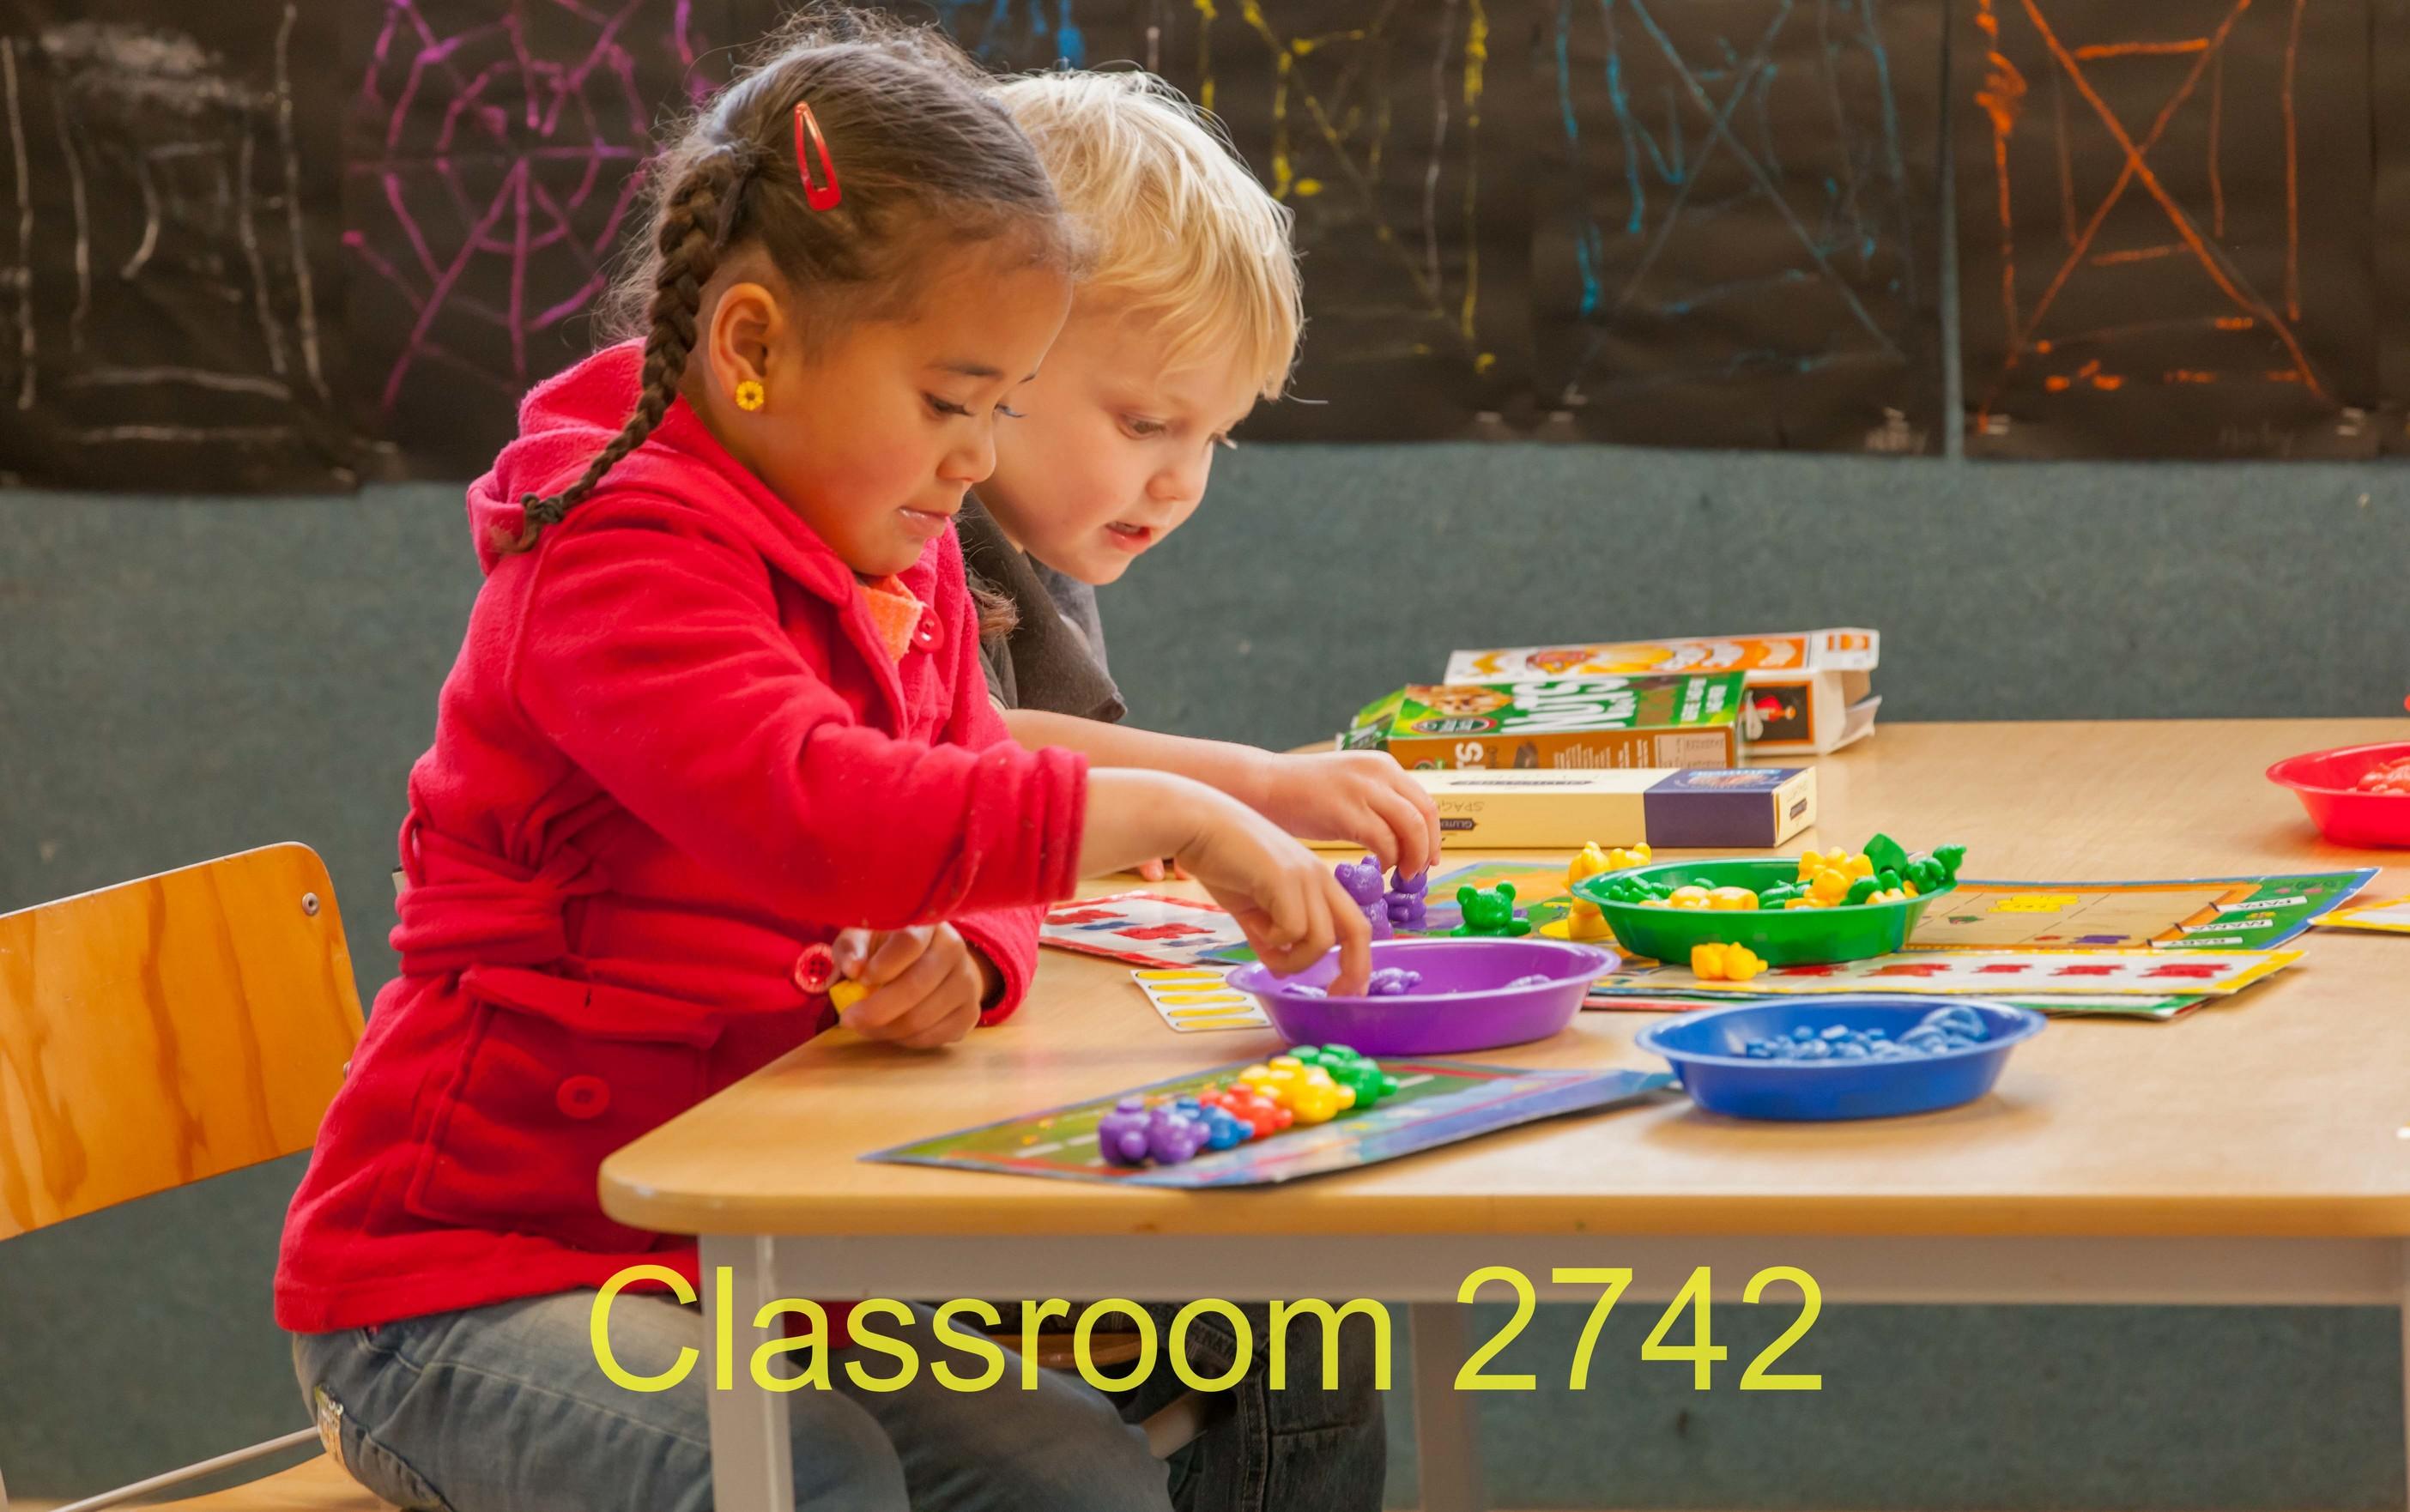 Classroom 2742